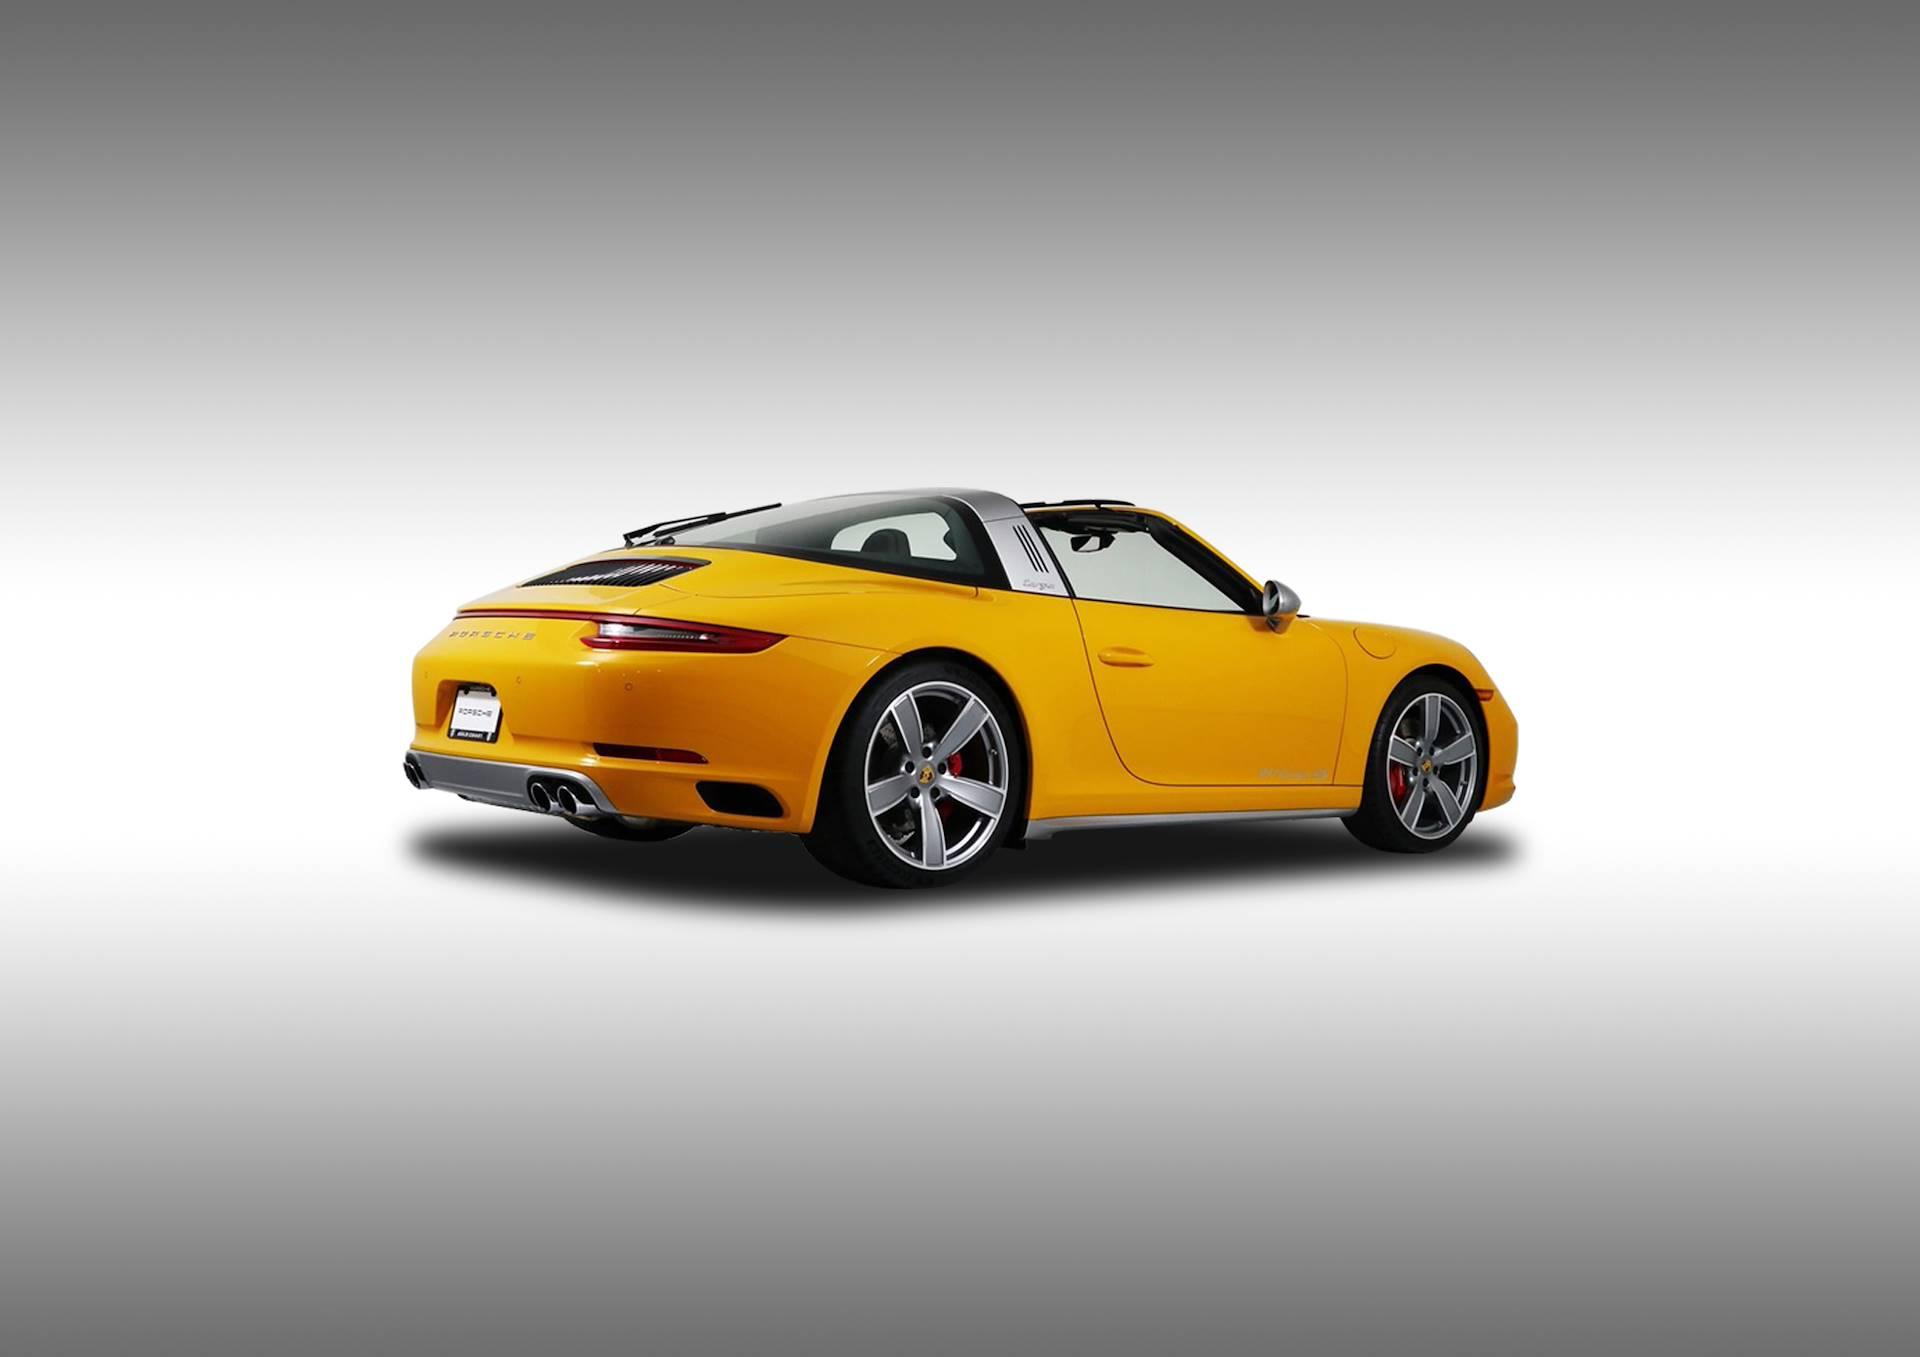 Supersprint Exhaust For Porsche 991 Targa 4 Gts 3 0i Turbo 450 Hp 2017 Std Quad Exhaust